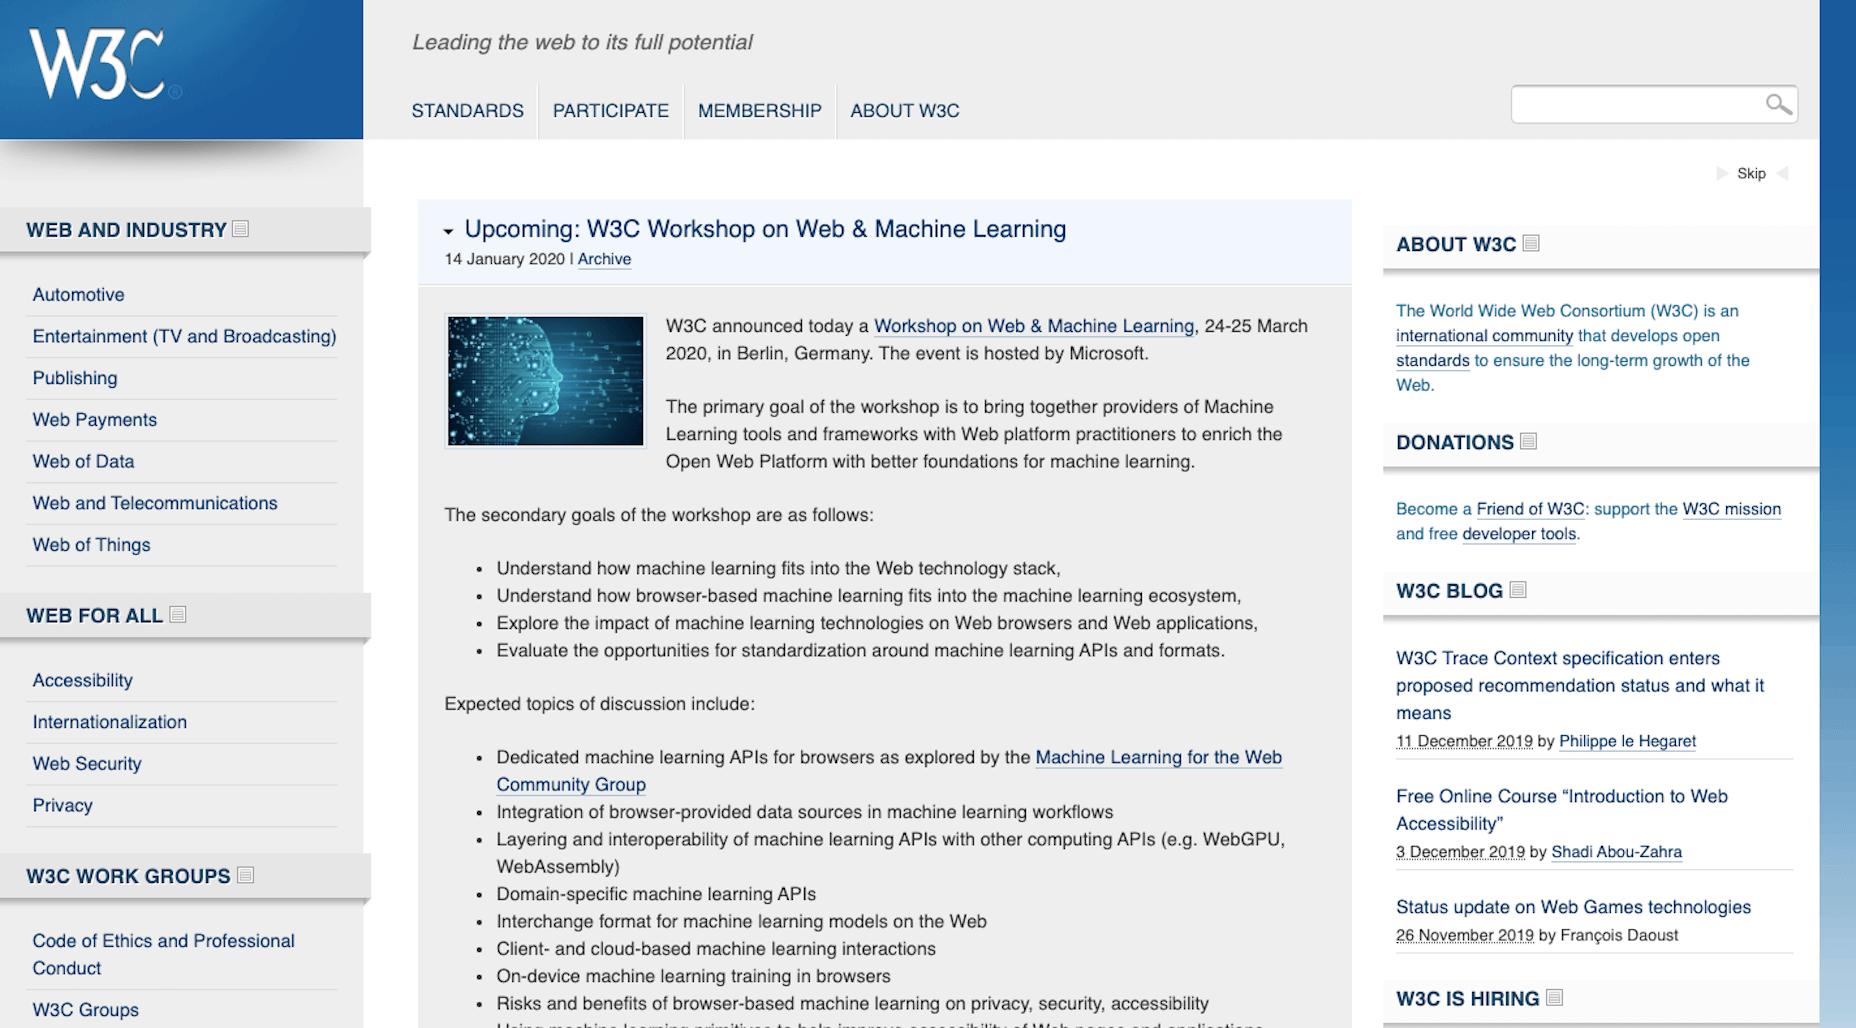 W3C Web Standards